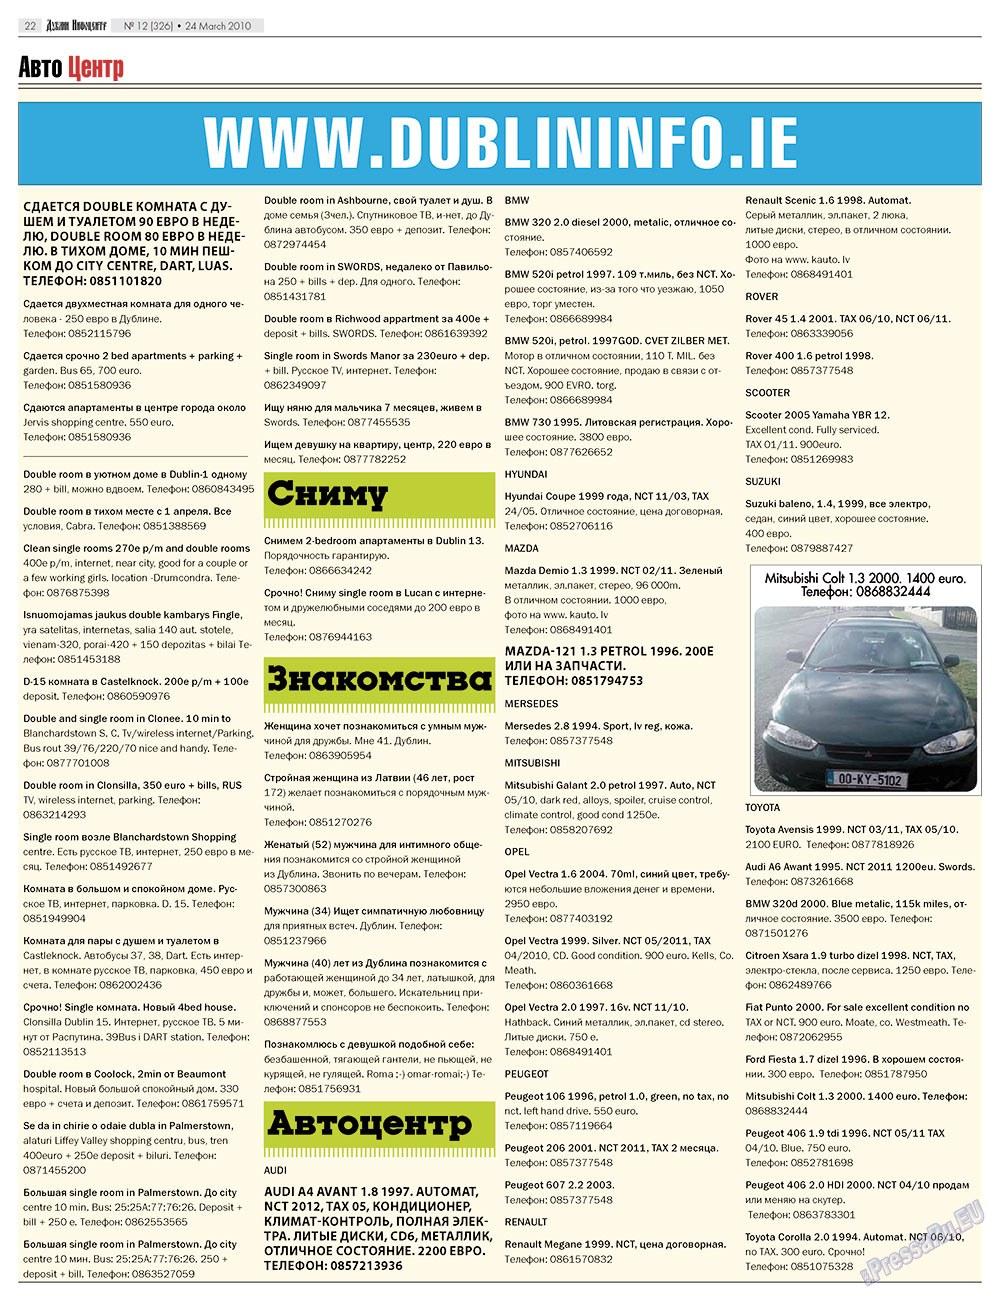 Дублин инфоцентр (газета). 2010 год, номер 12, стр. 22